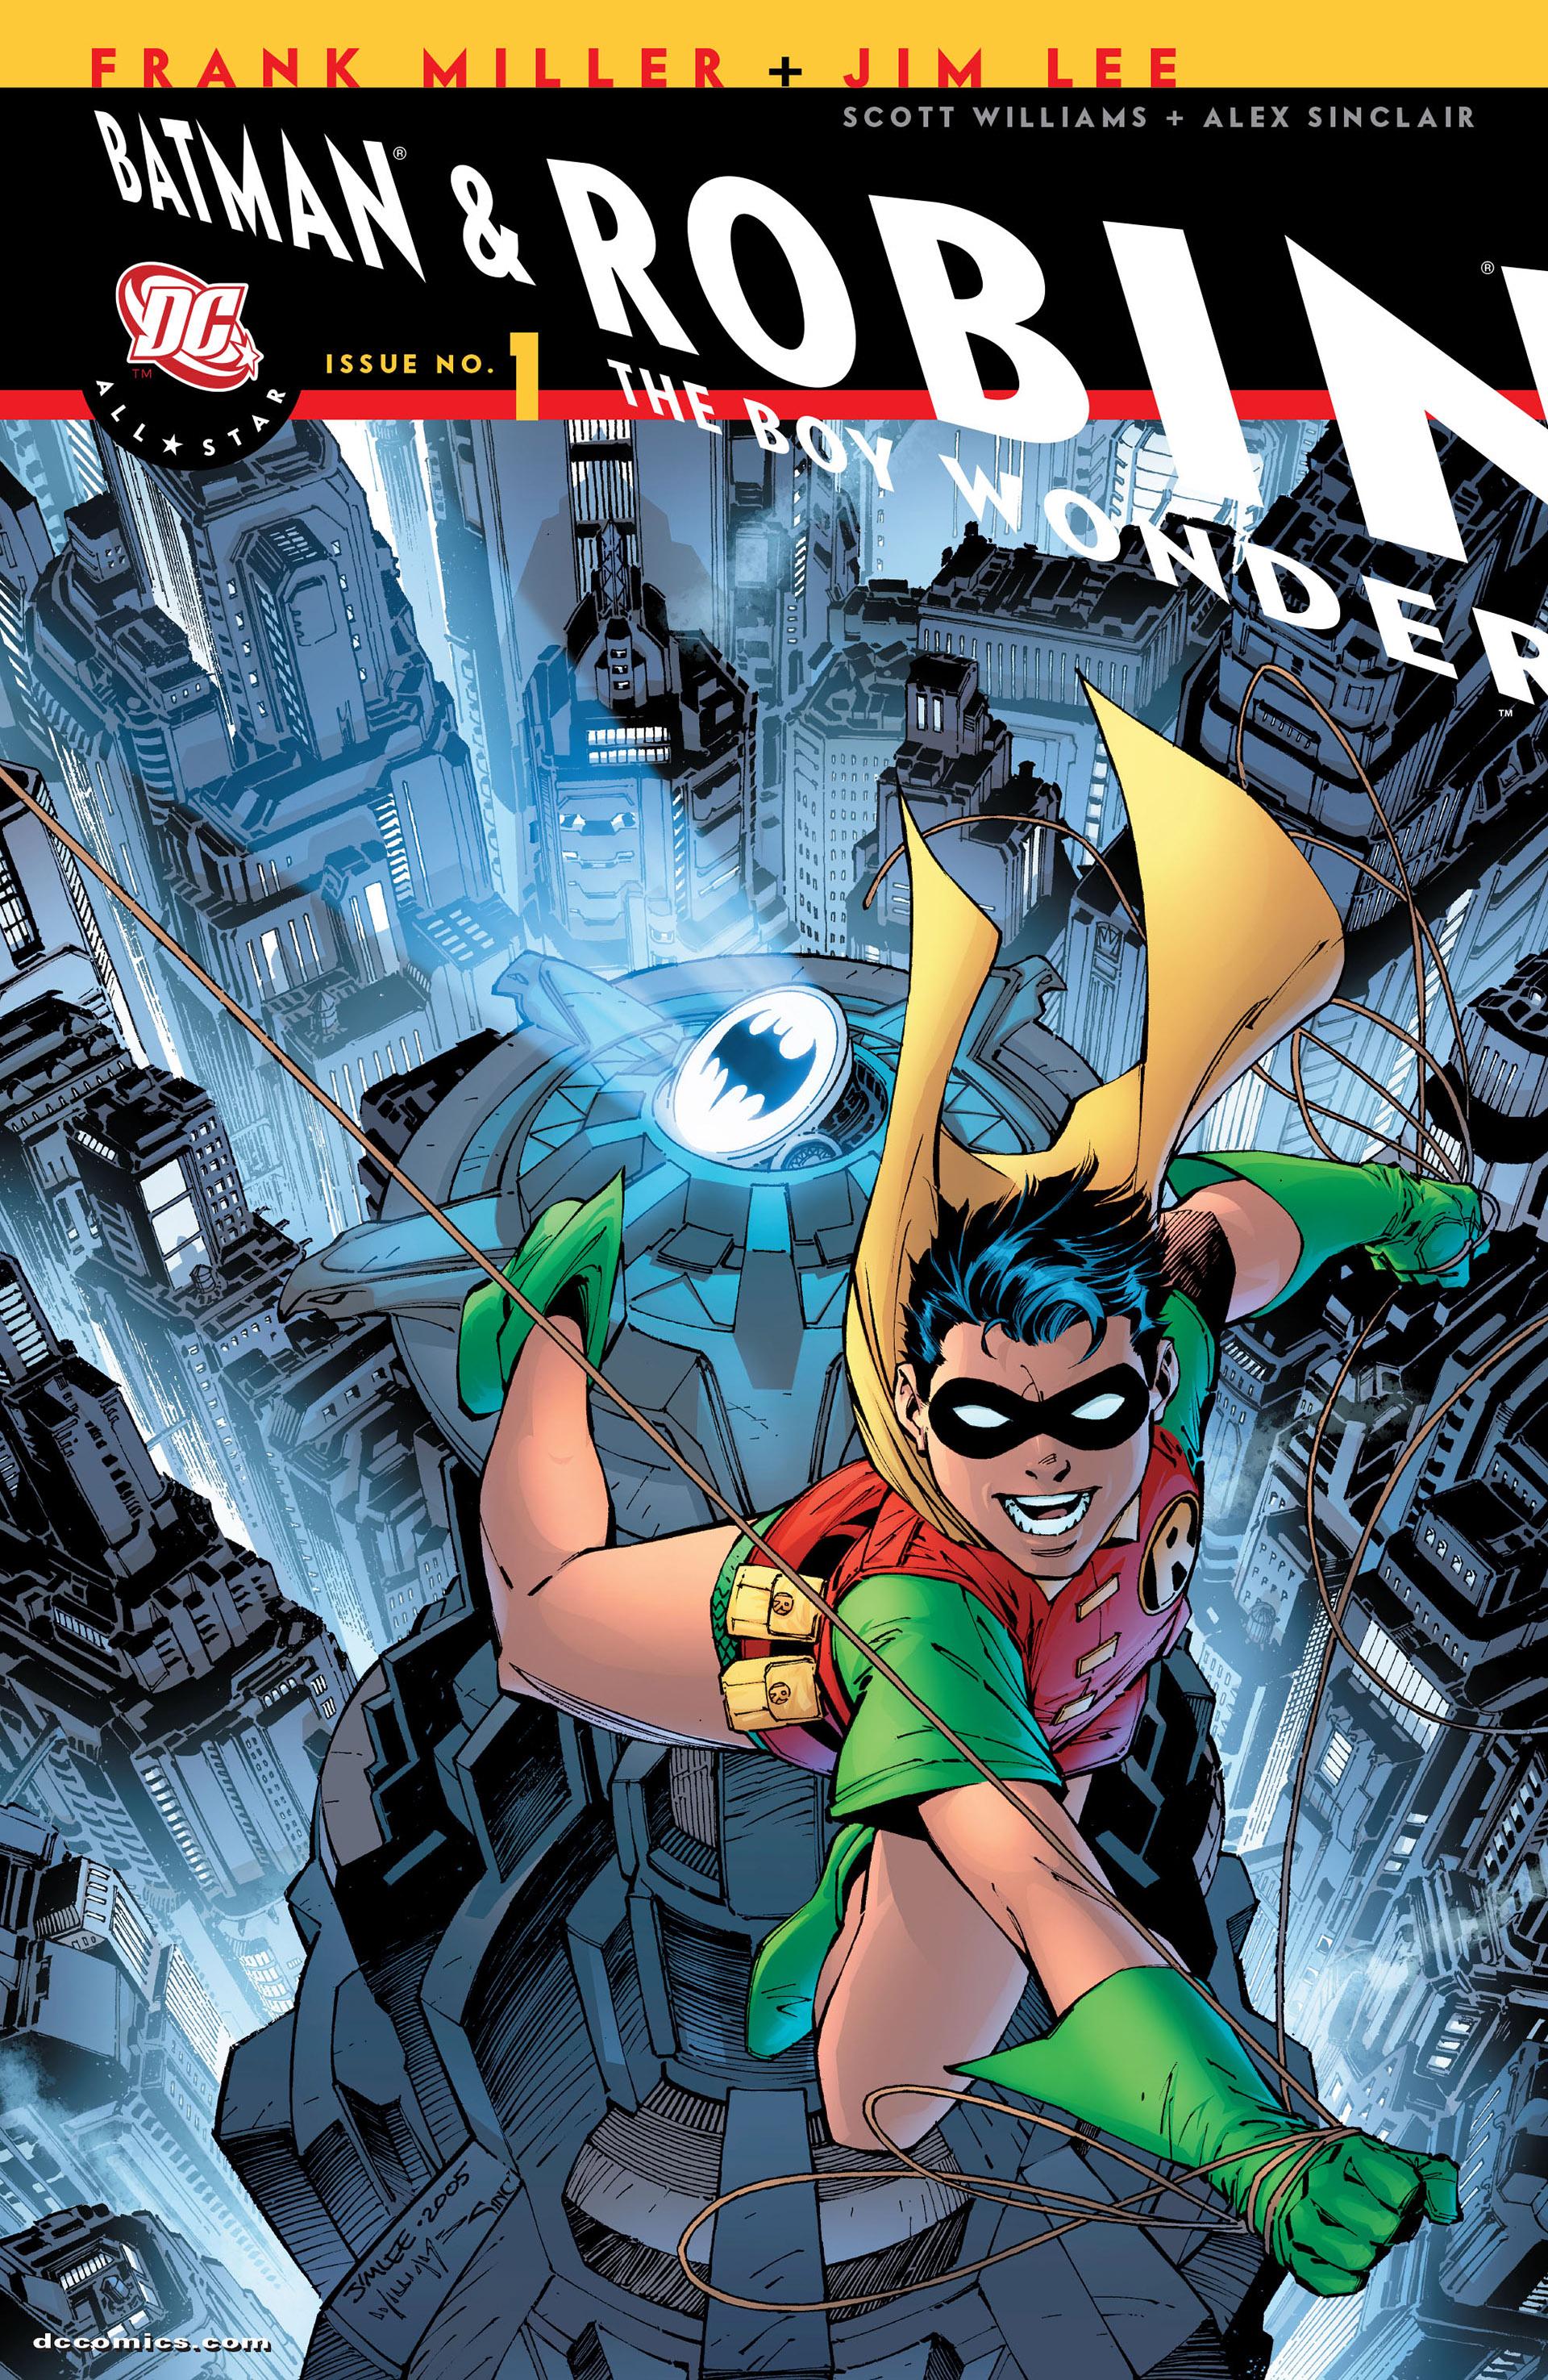 Read online All Star Batman & Robin, The Boy Wonder comic -  Issue #1 - 2